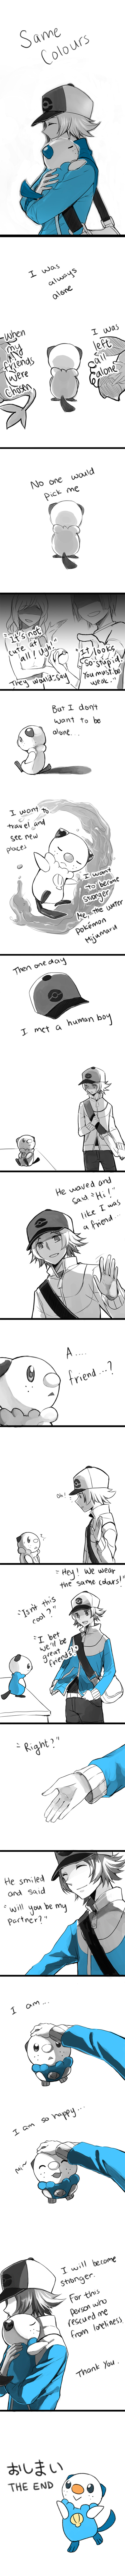 Tags: Anime, Cezaria, Pokémon, Touya (Pokémon), Oshawott, Silver (Pokémon), deviantART, Pixiv, Comic